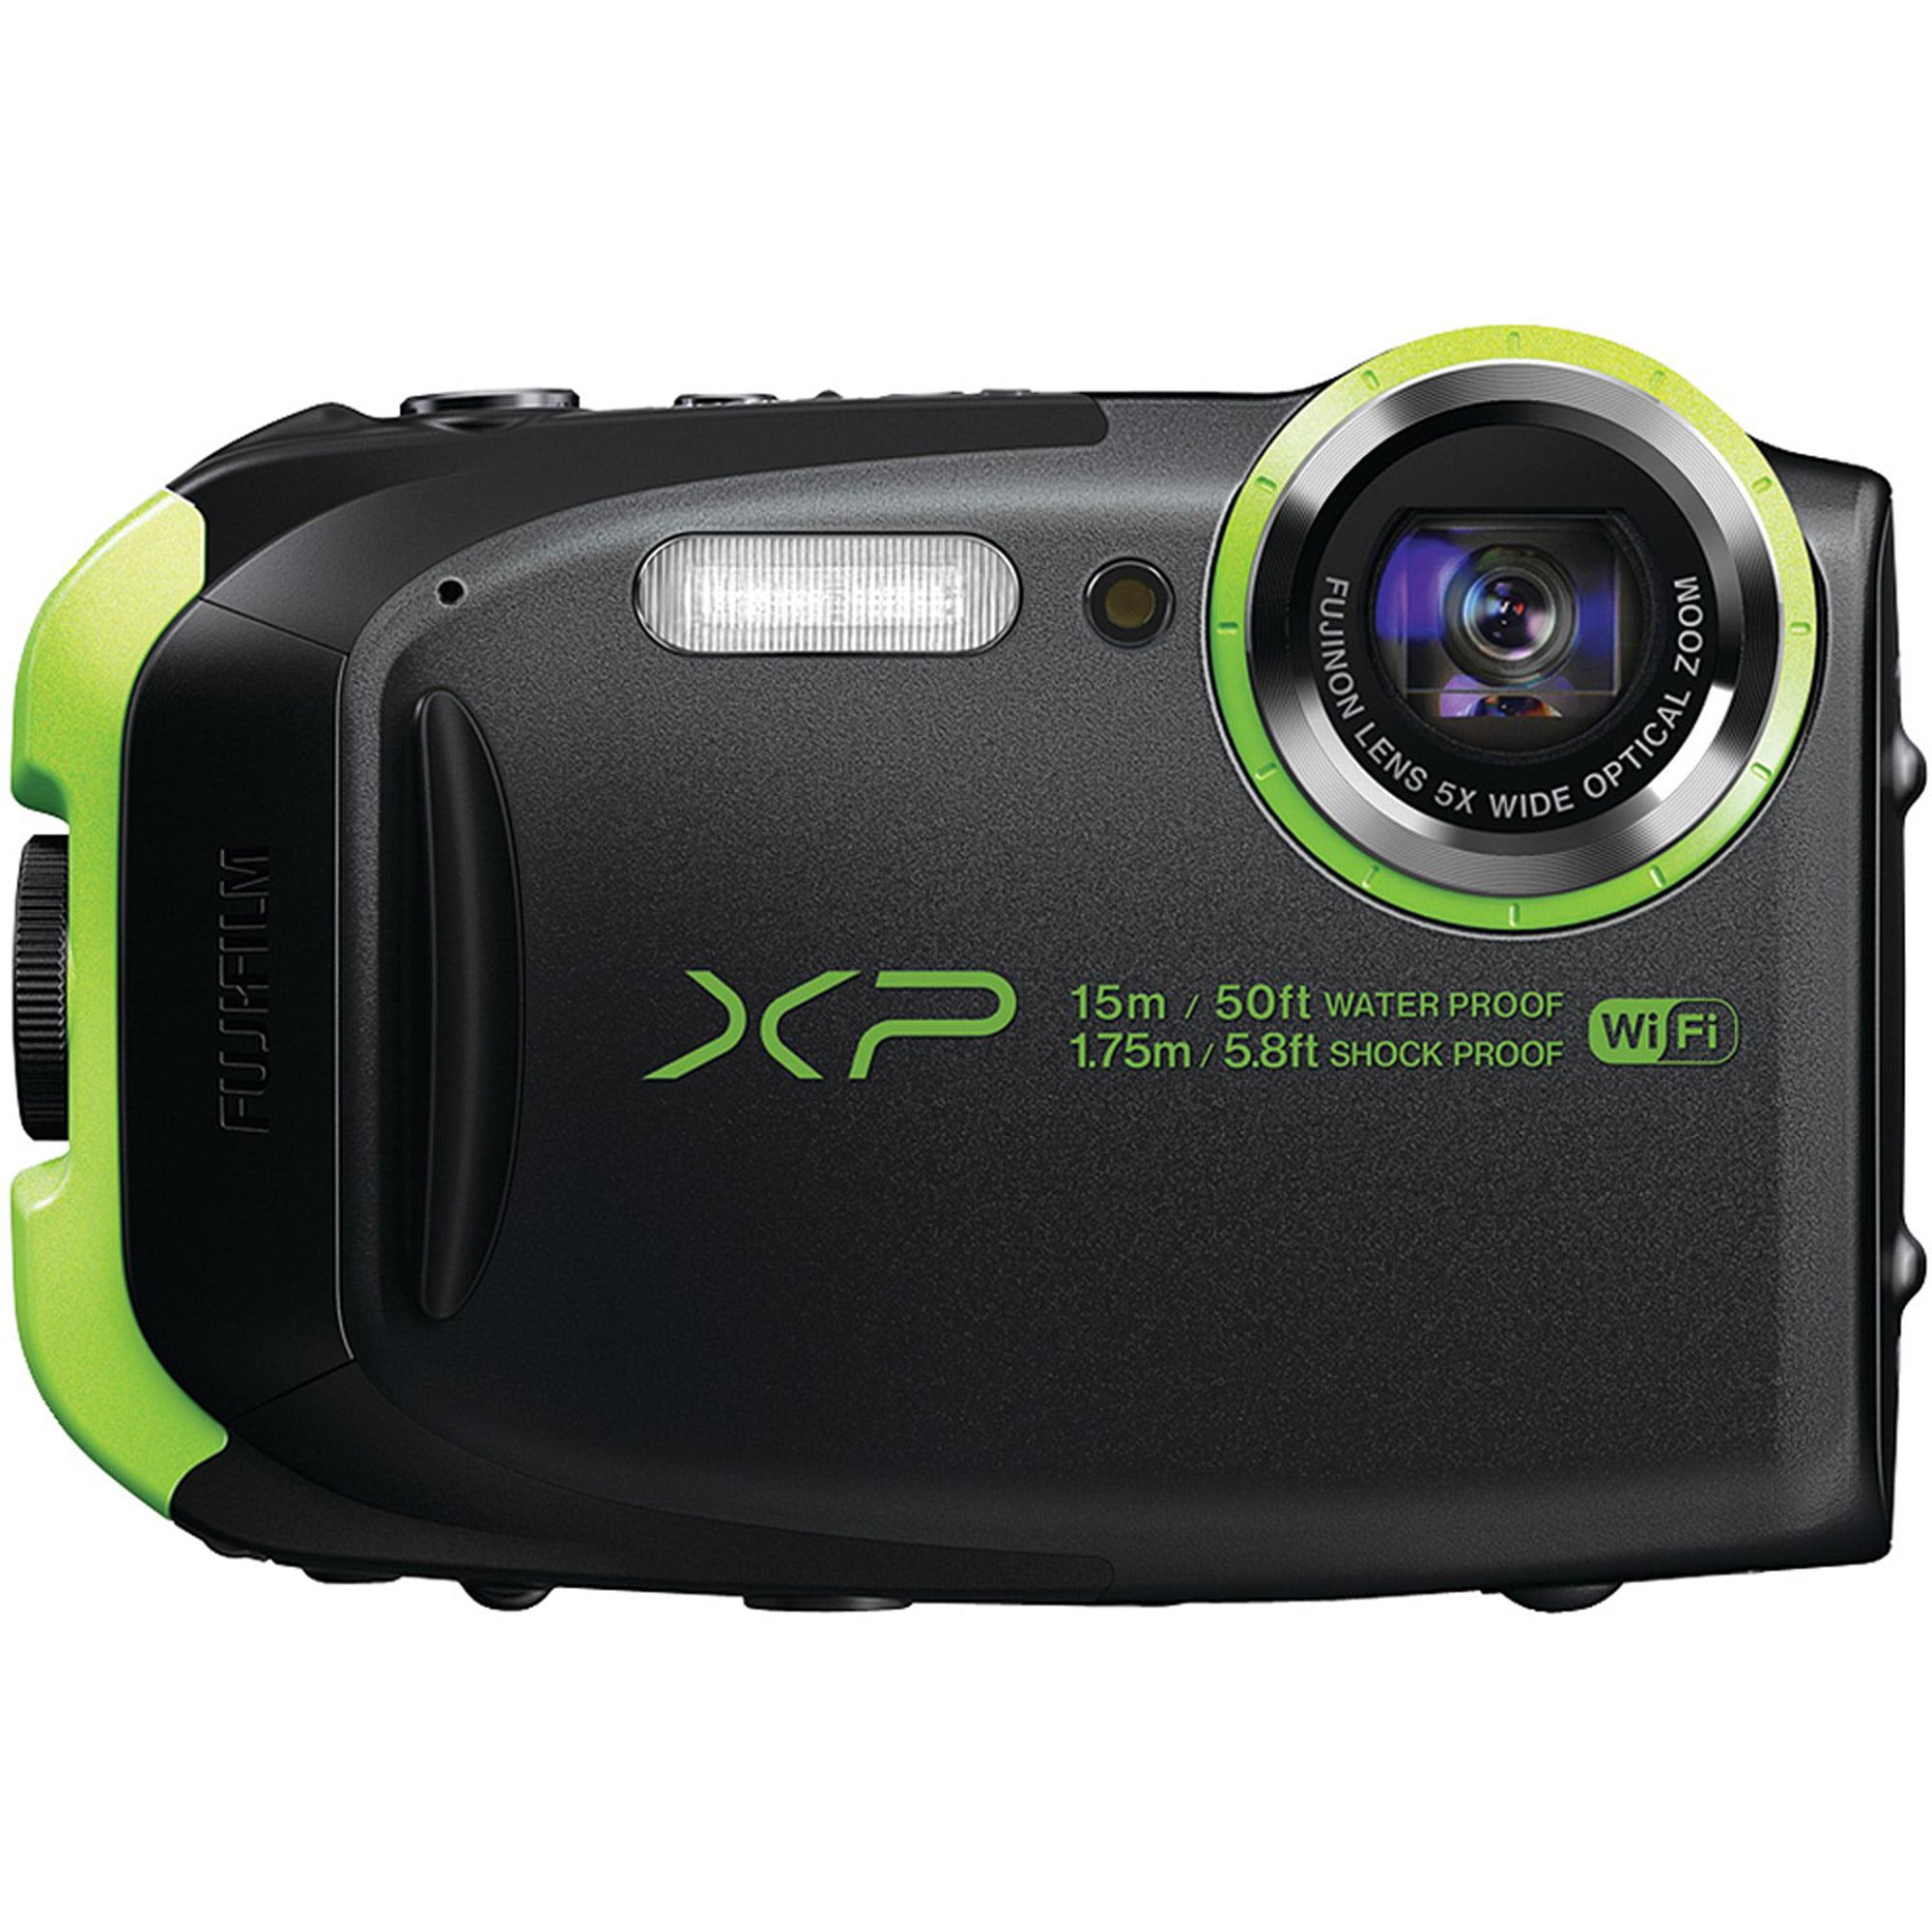 Fujifilm FinePix XP80 Waterproof Digital Camera with 2.7-Inch LCD (Graphite Black)